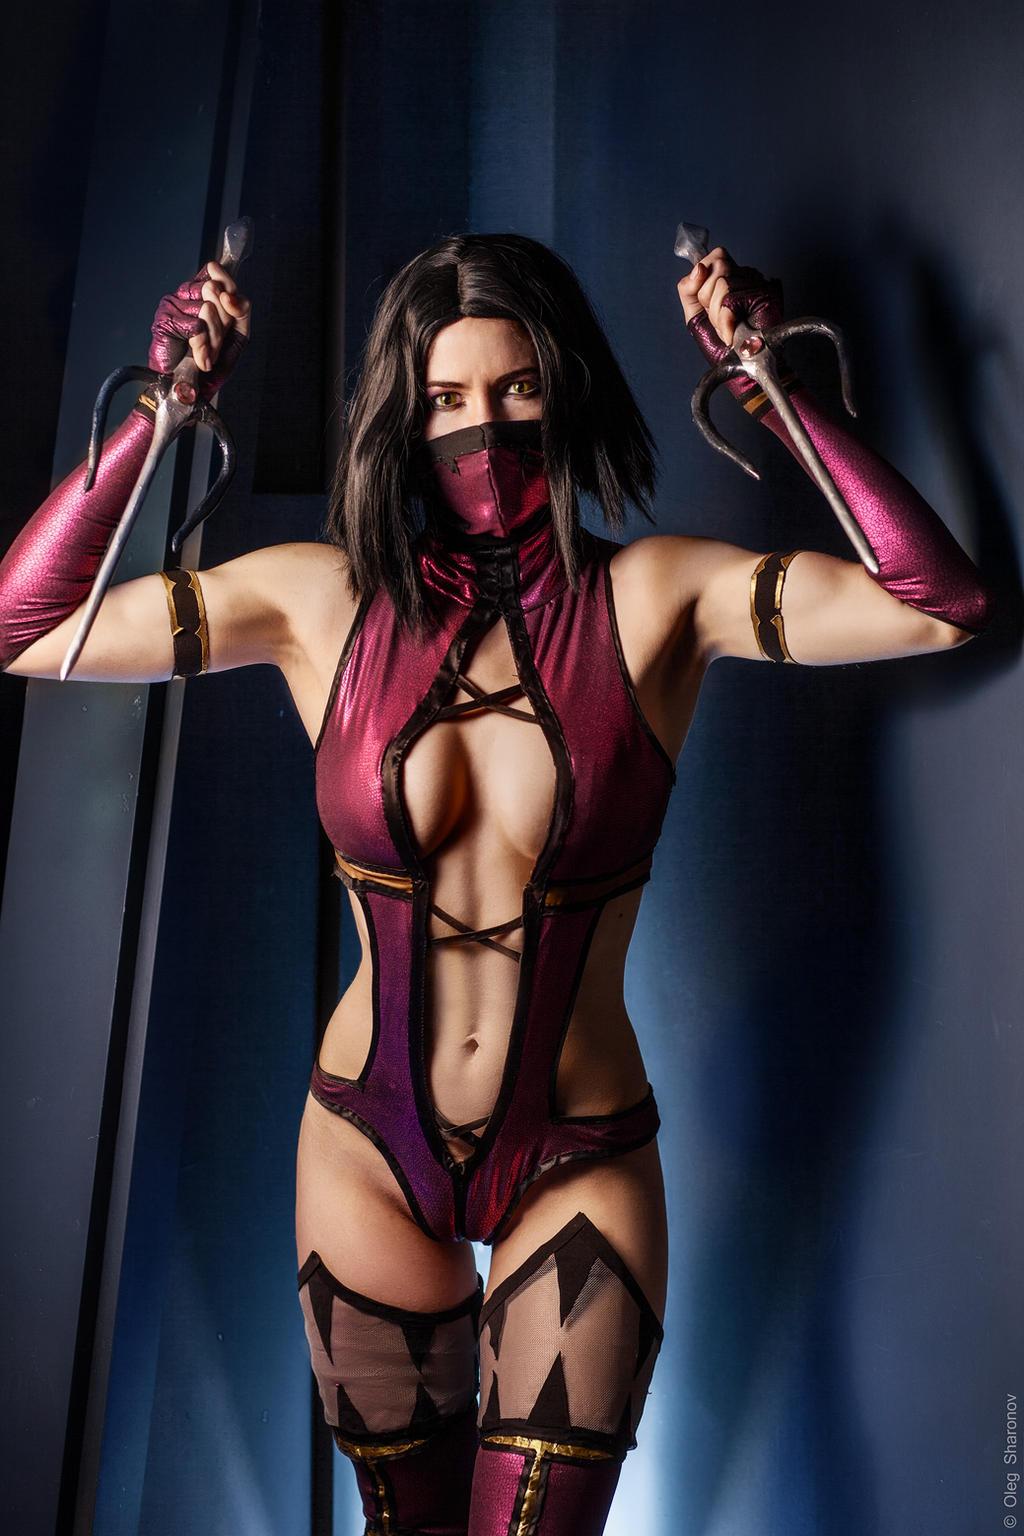 Mortal kombat kitana cosplay dildo fuck 3